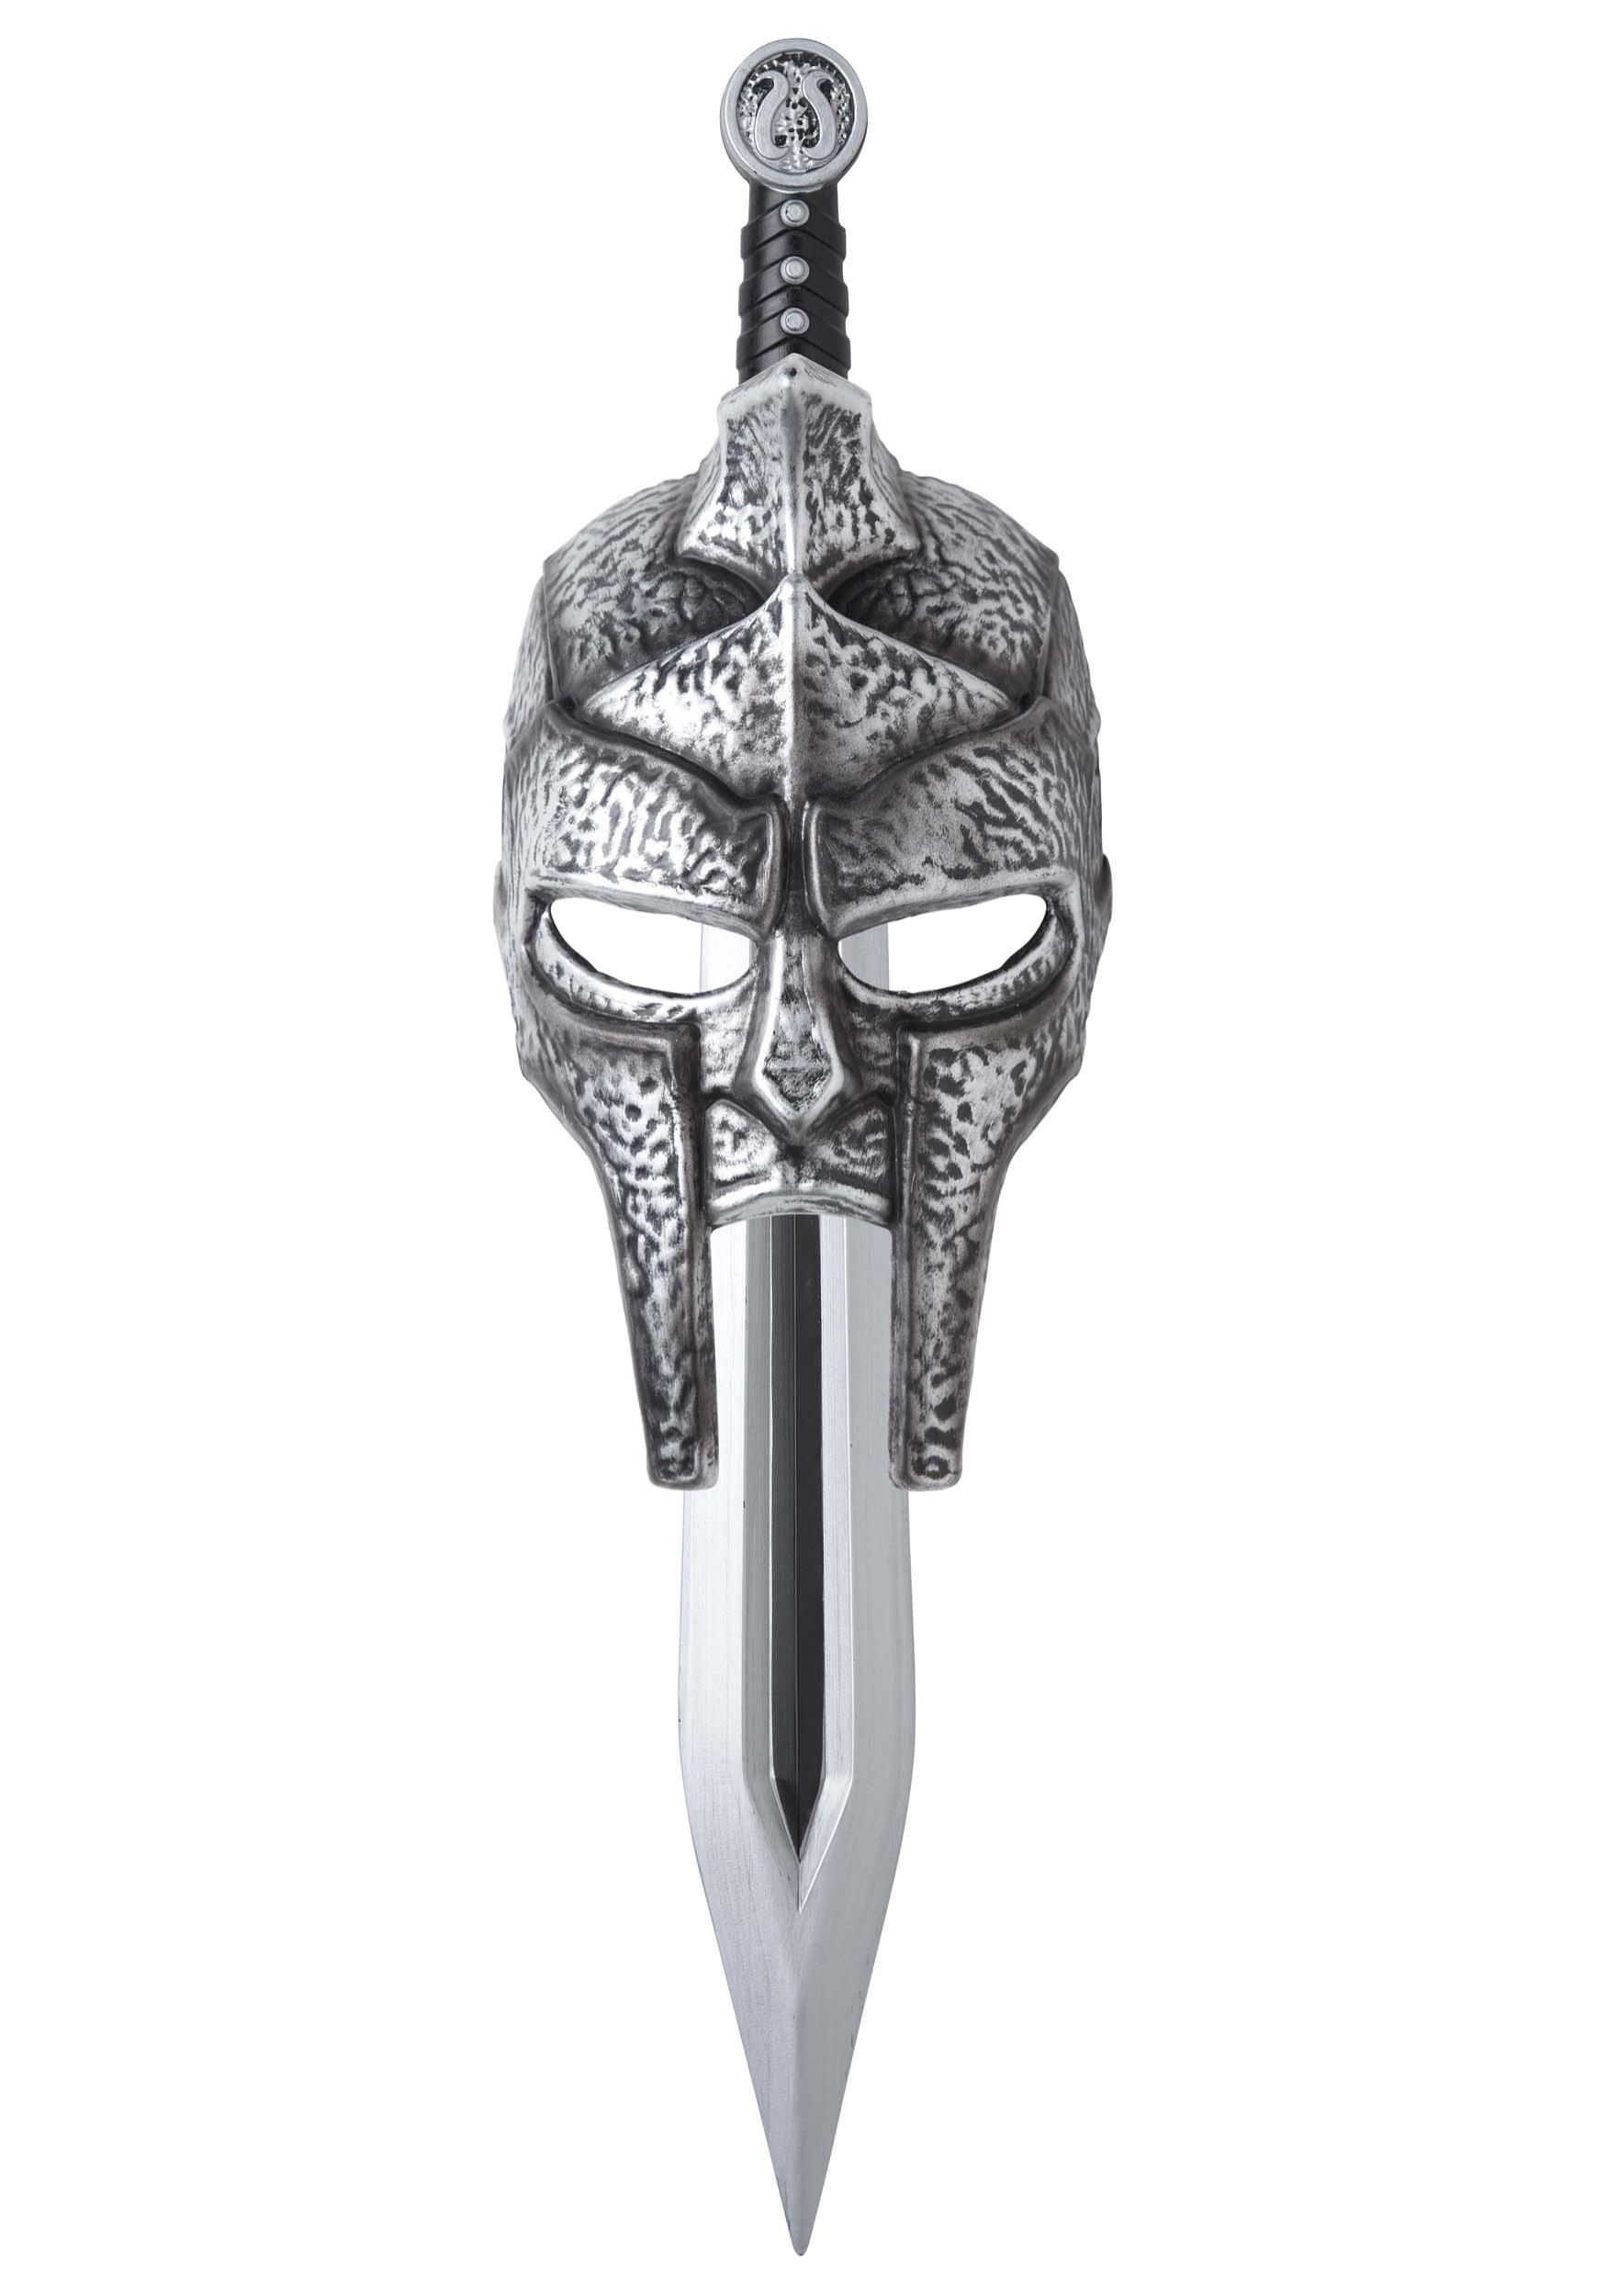 Gladiator Mask and Sword for Kids